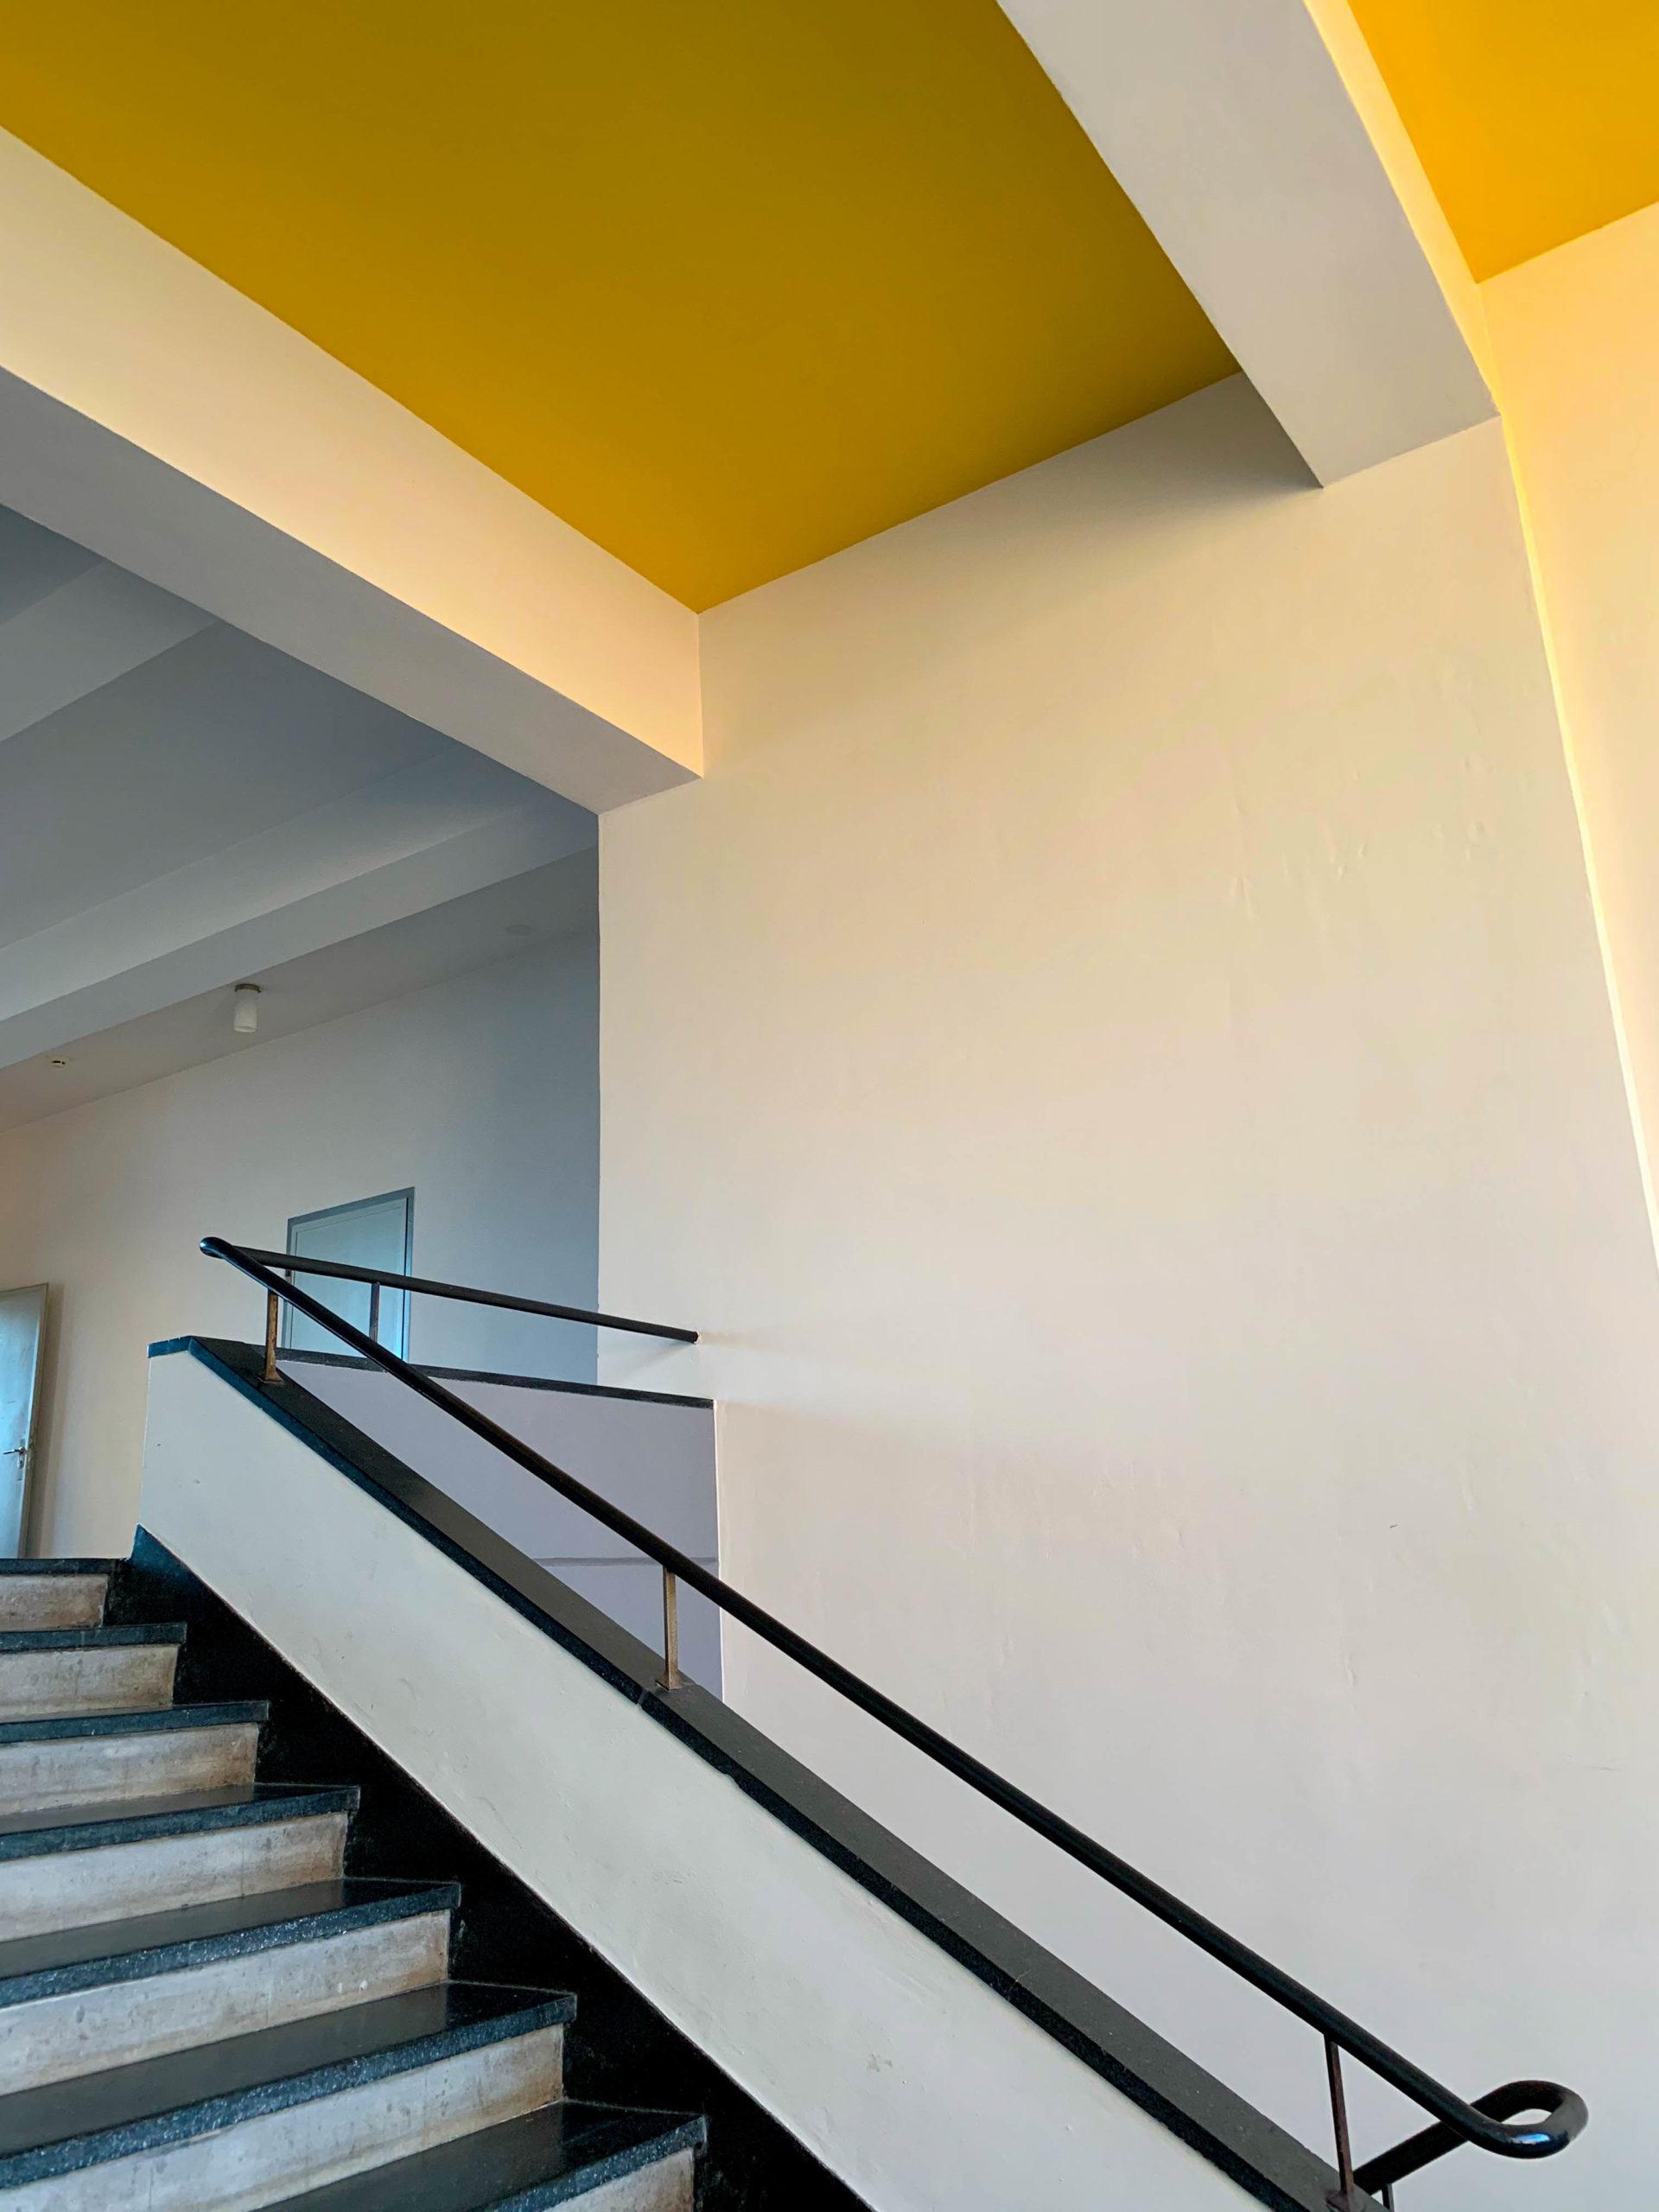 Bauhaus Building, 1925-1926. Architect: Walter Gropius